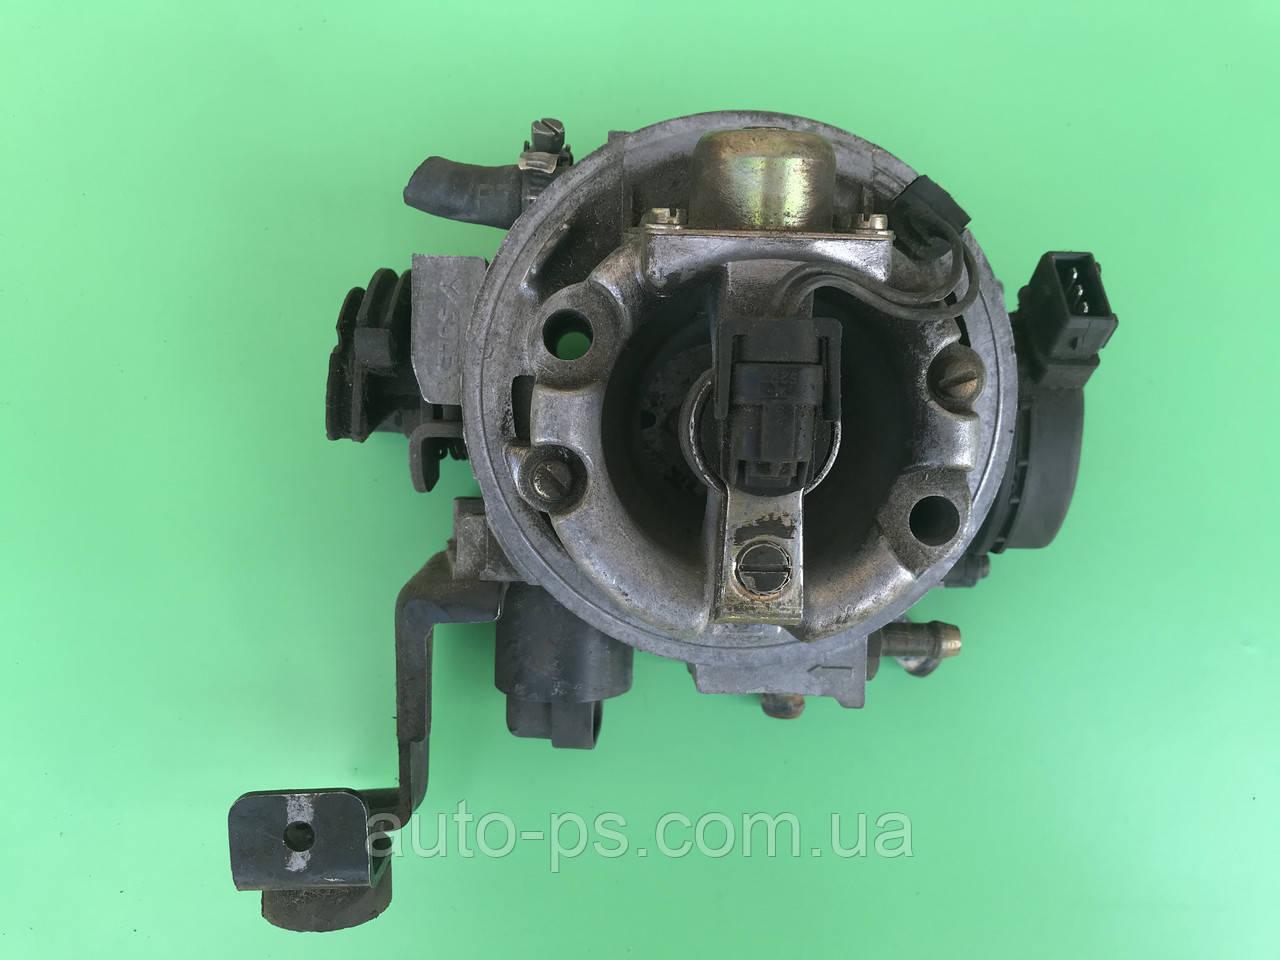 Моноинжектор Peugeot 106 1.6